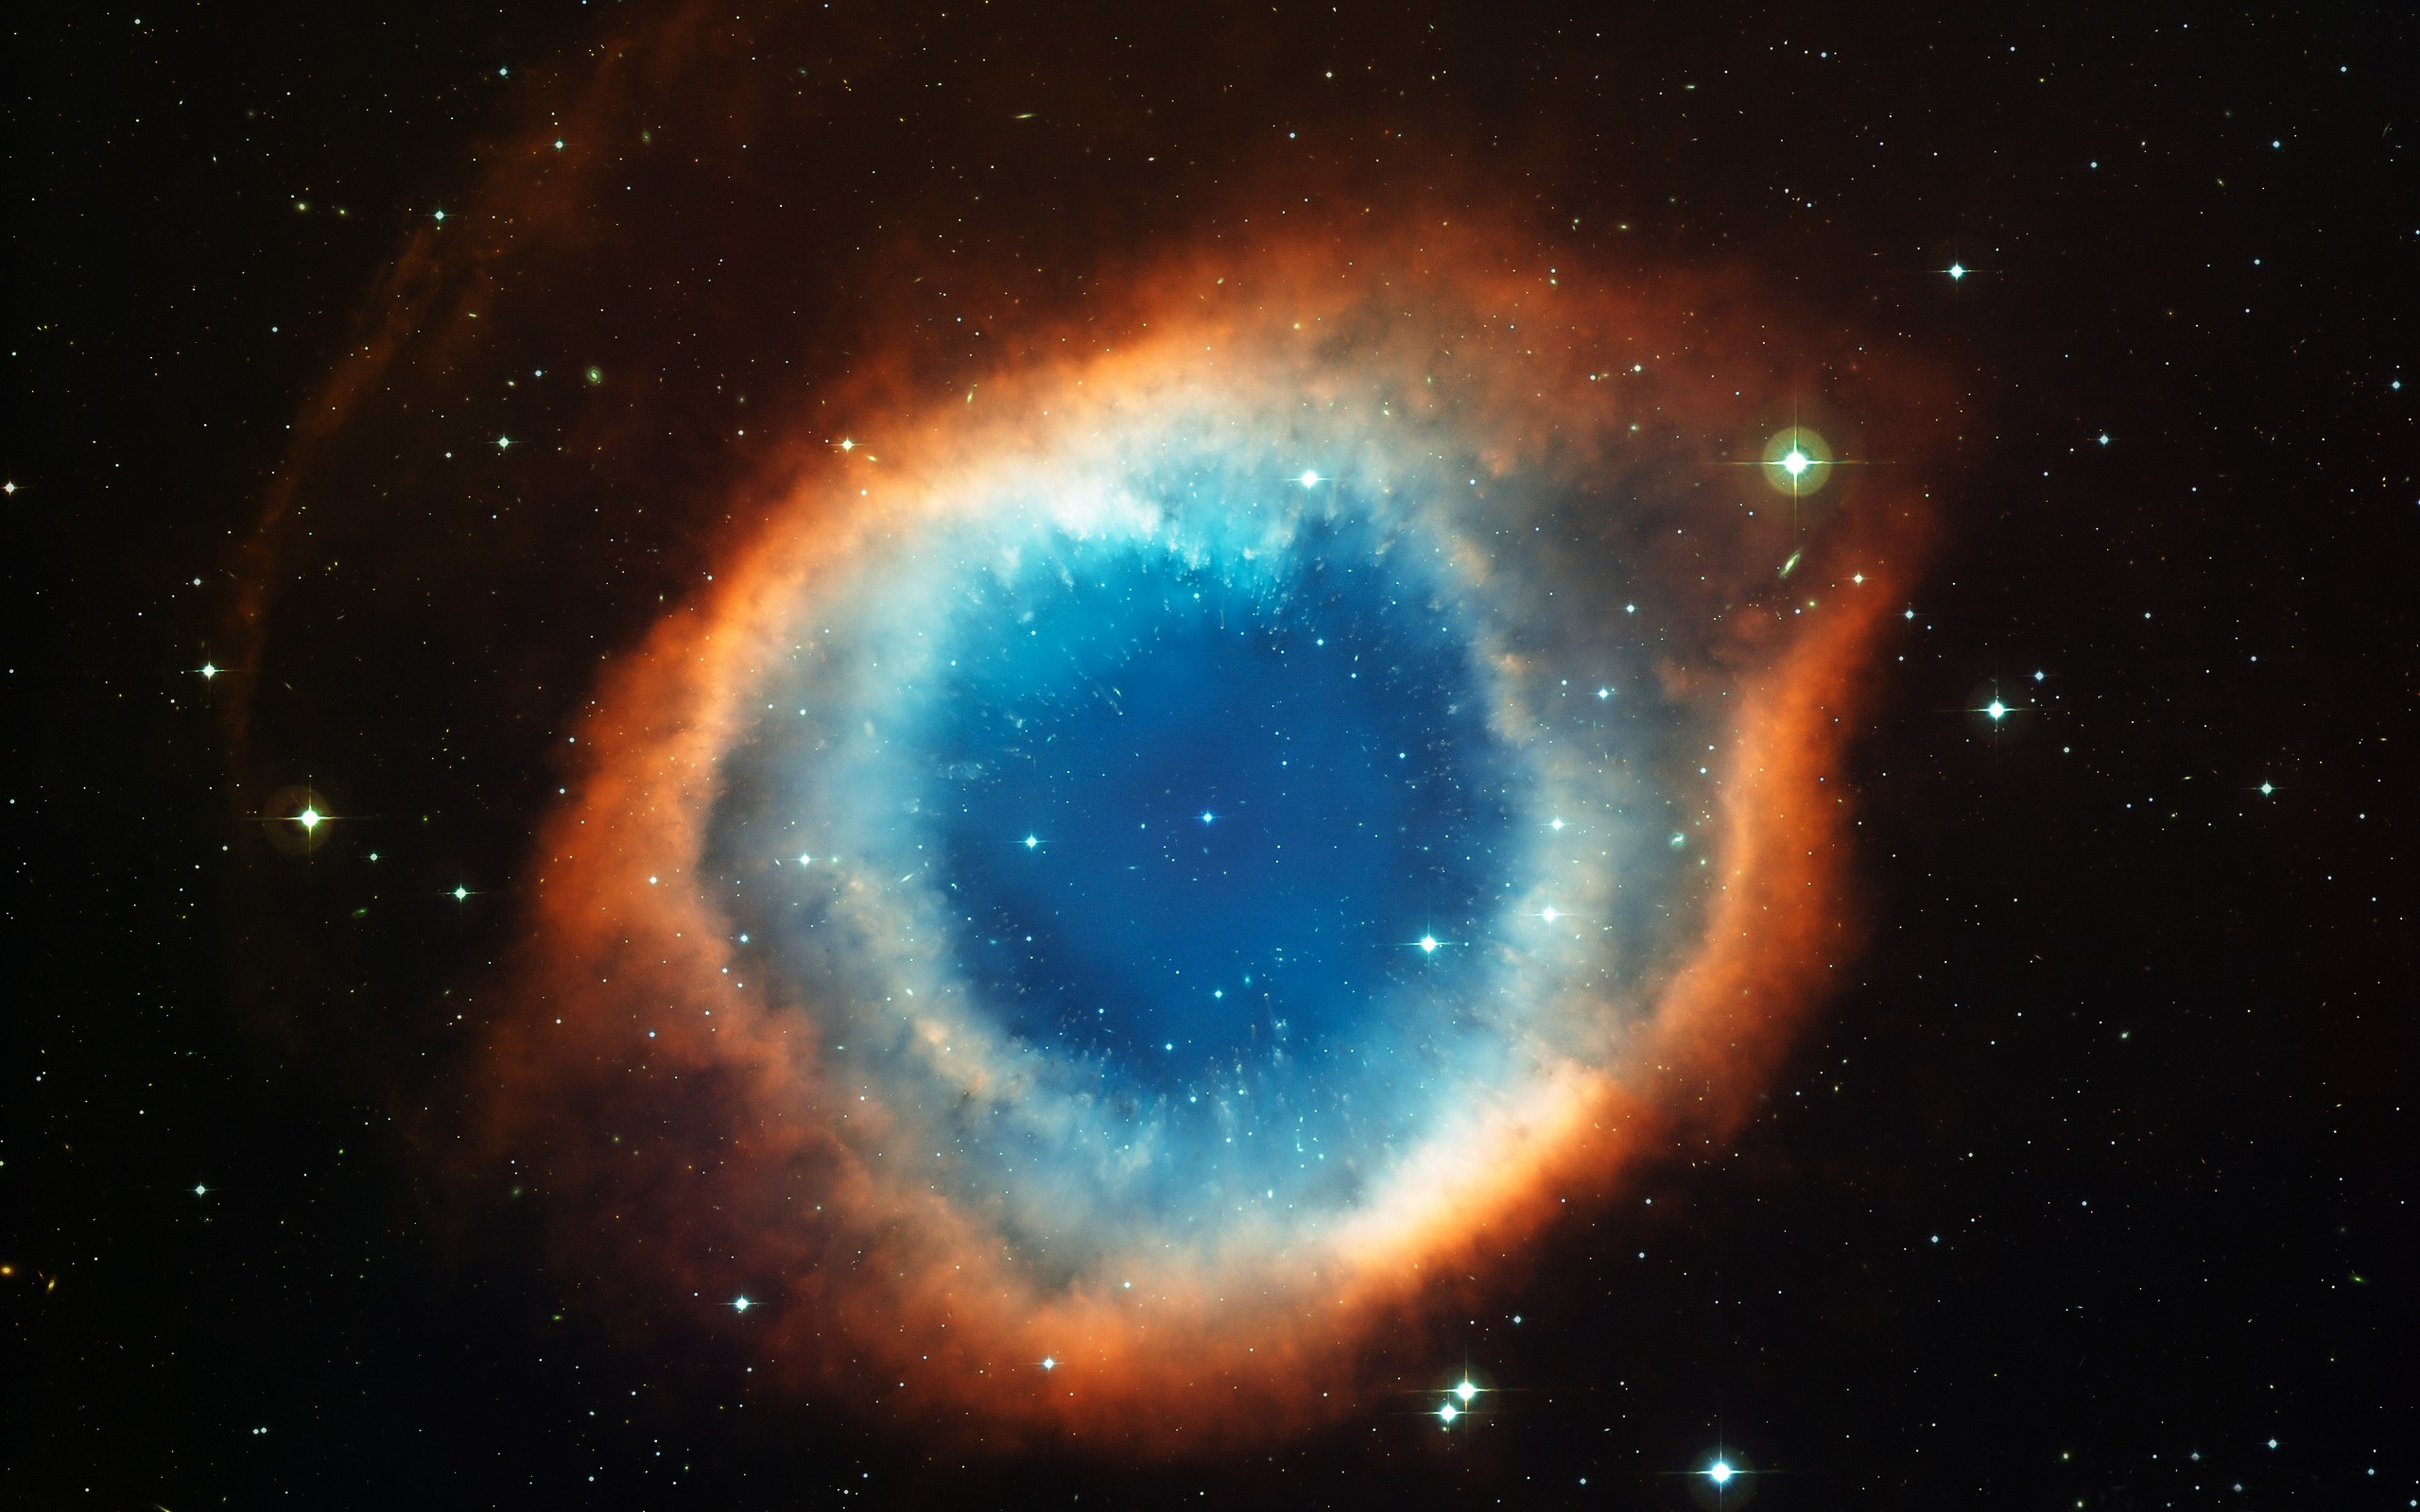 Helix Nebula Eye Of God Wallpaper 2560X1600 World Wallpaper Collection 2560x1600